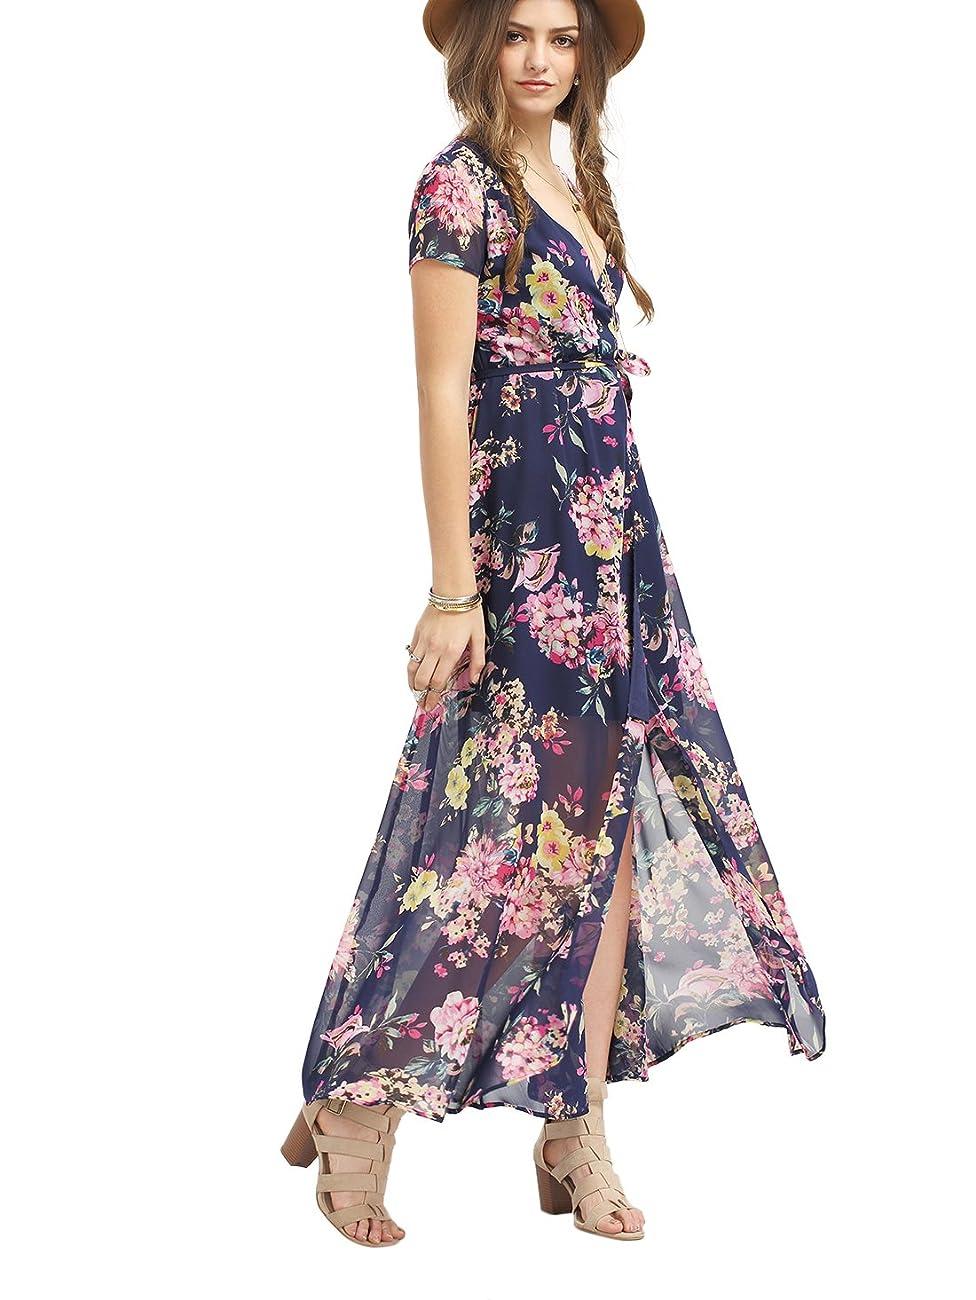 Milumia Women's Vintage Floral Print Split Wrap Maxi Dress 2